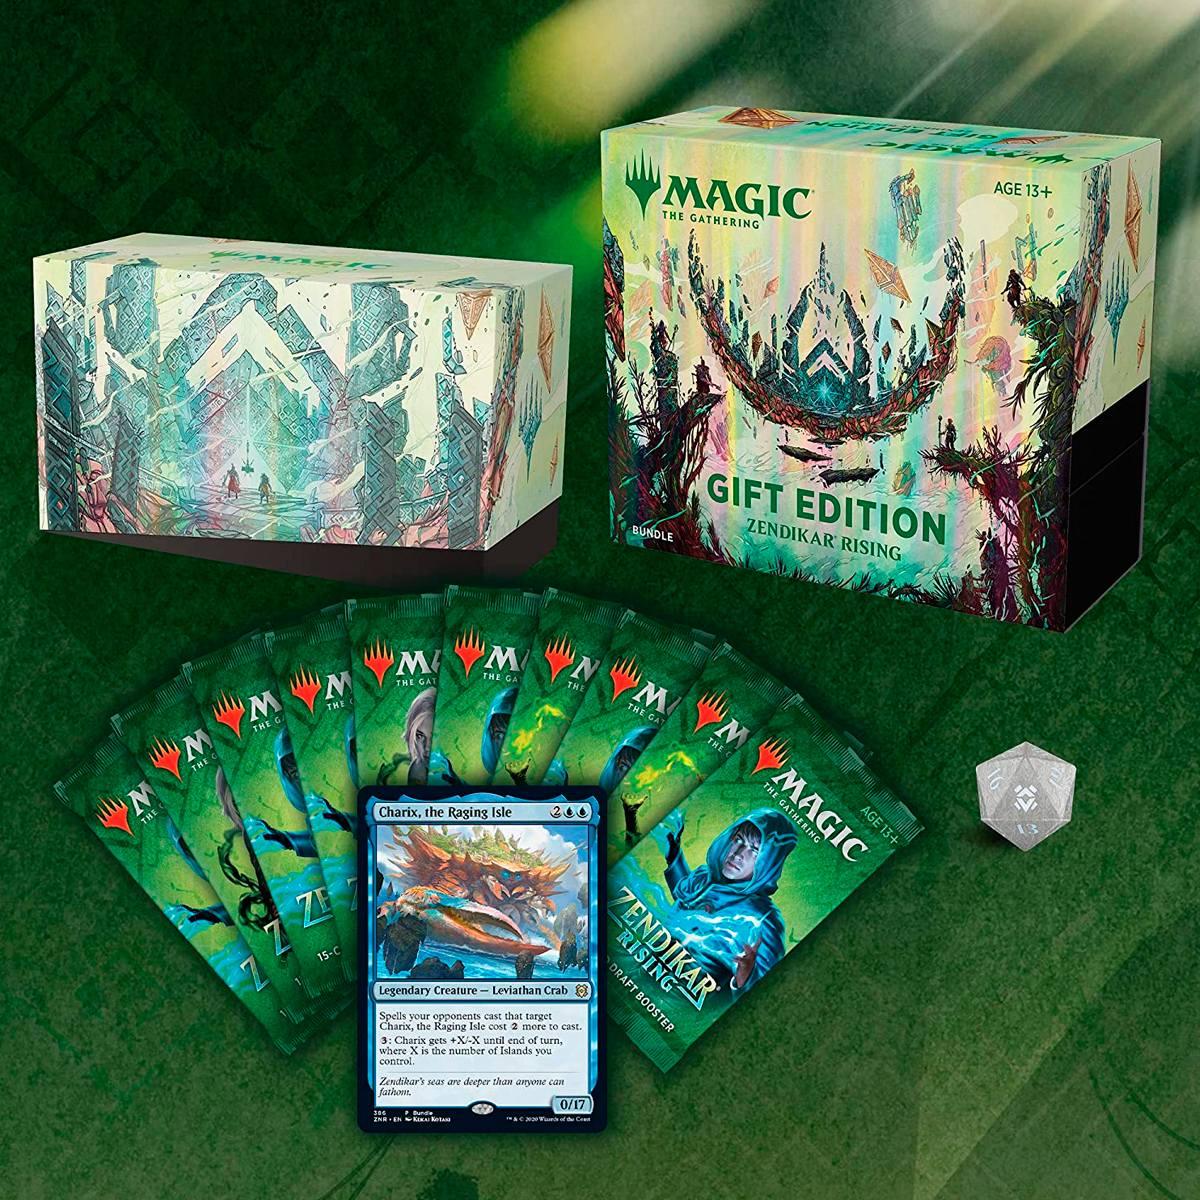 Magic Bundle Gift Edition Zendikar Rising Inglês